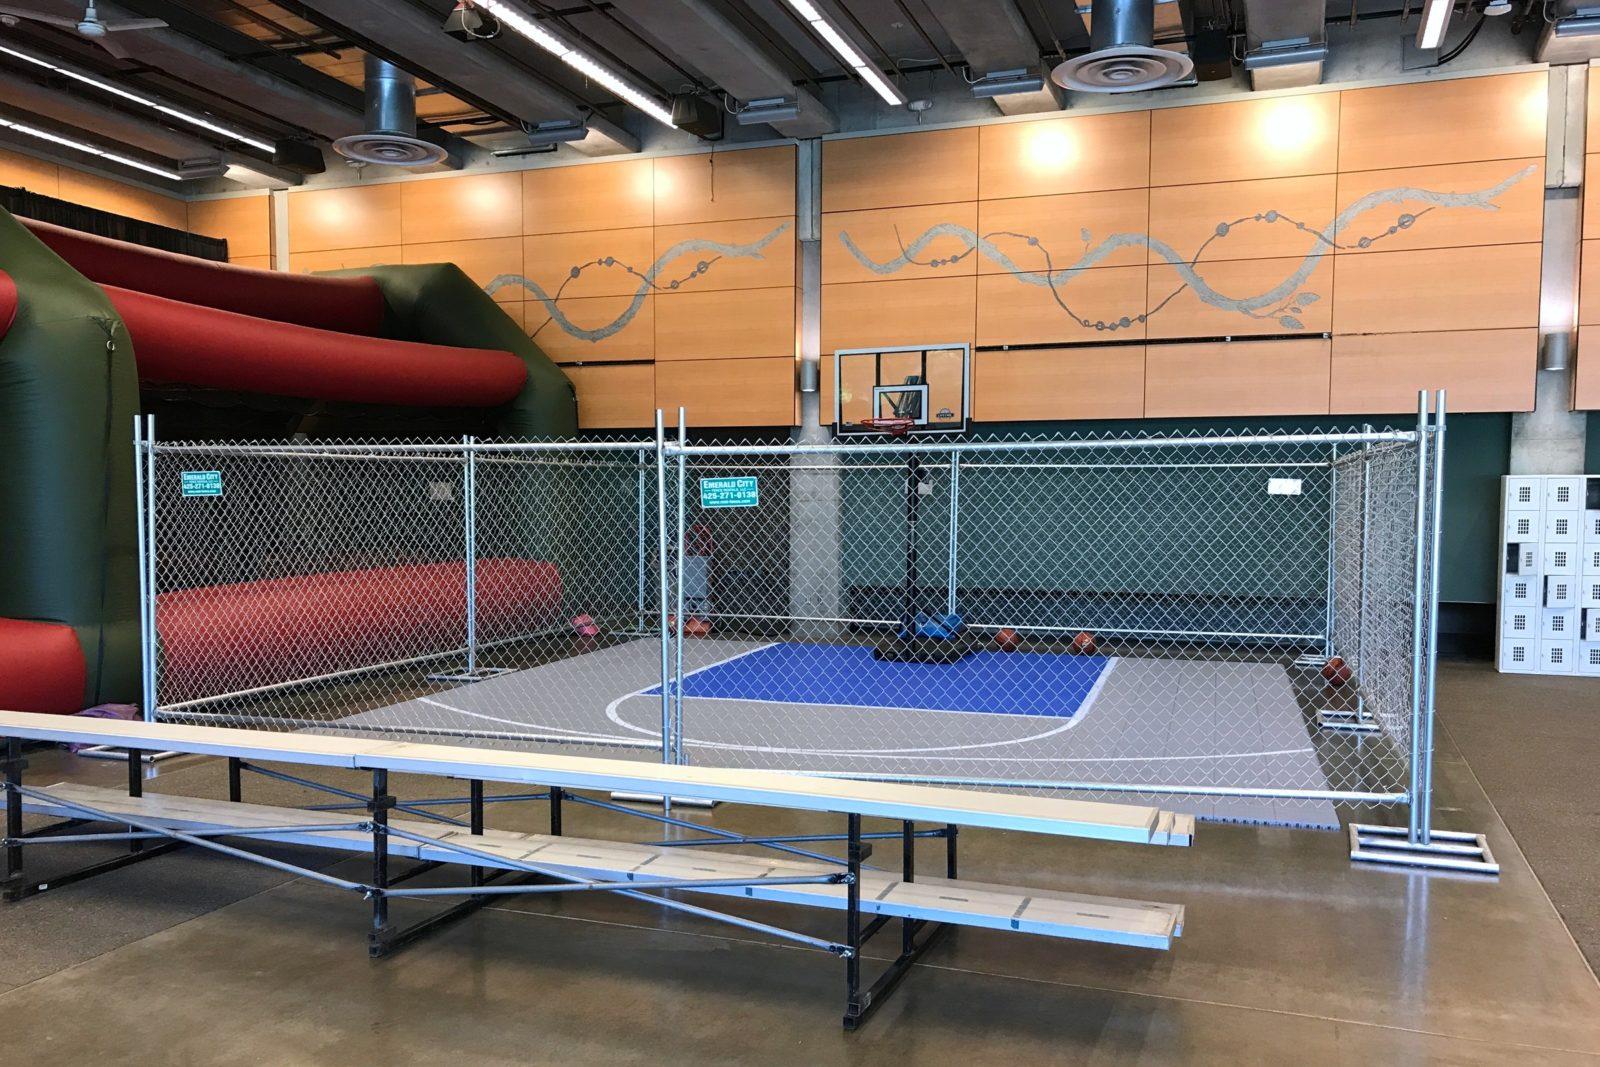 Portable Basketball Court : Portable basketball court rental — national event pros